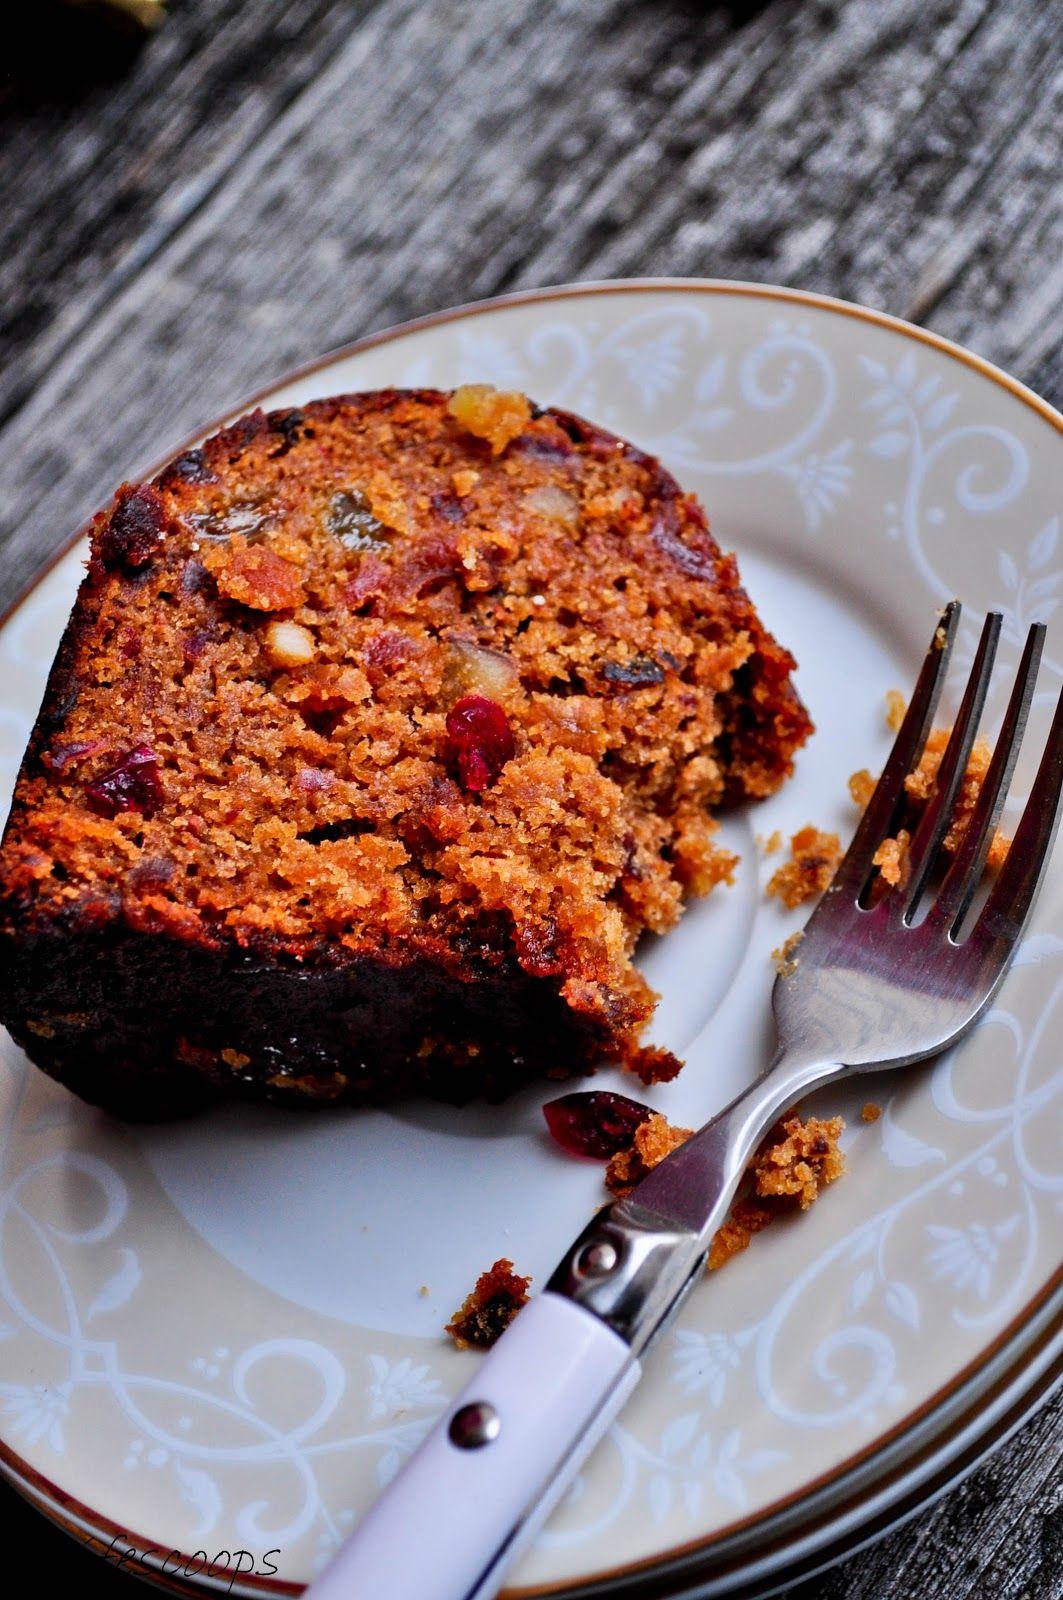 Life Scoops Christmas Fruit Cake Kerala Plum Cake Christmas Plum Cake Recipe Fruit Cake Christmas Fruit Cake